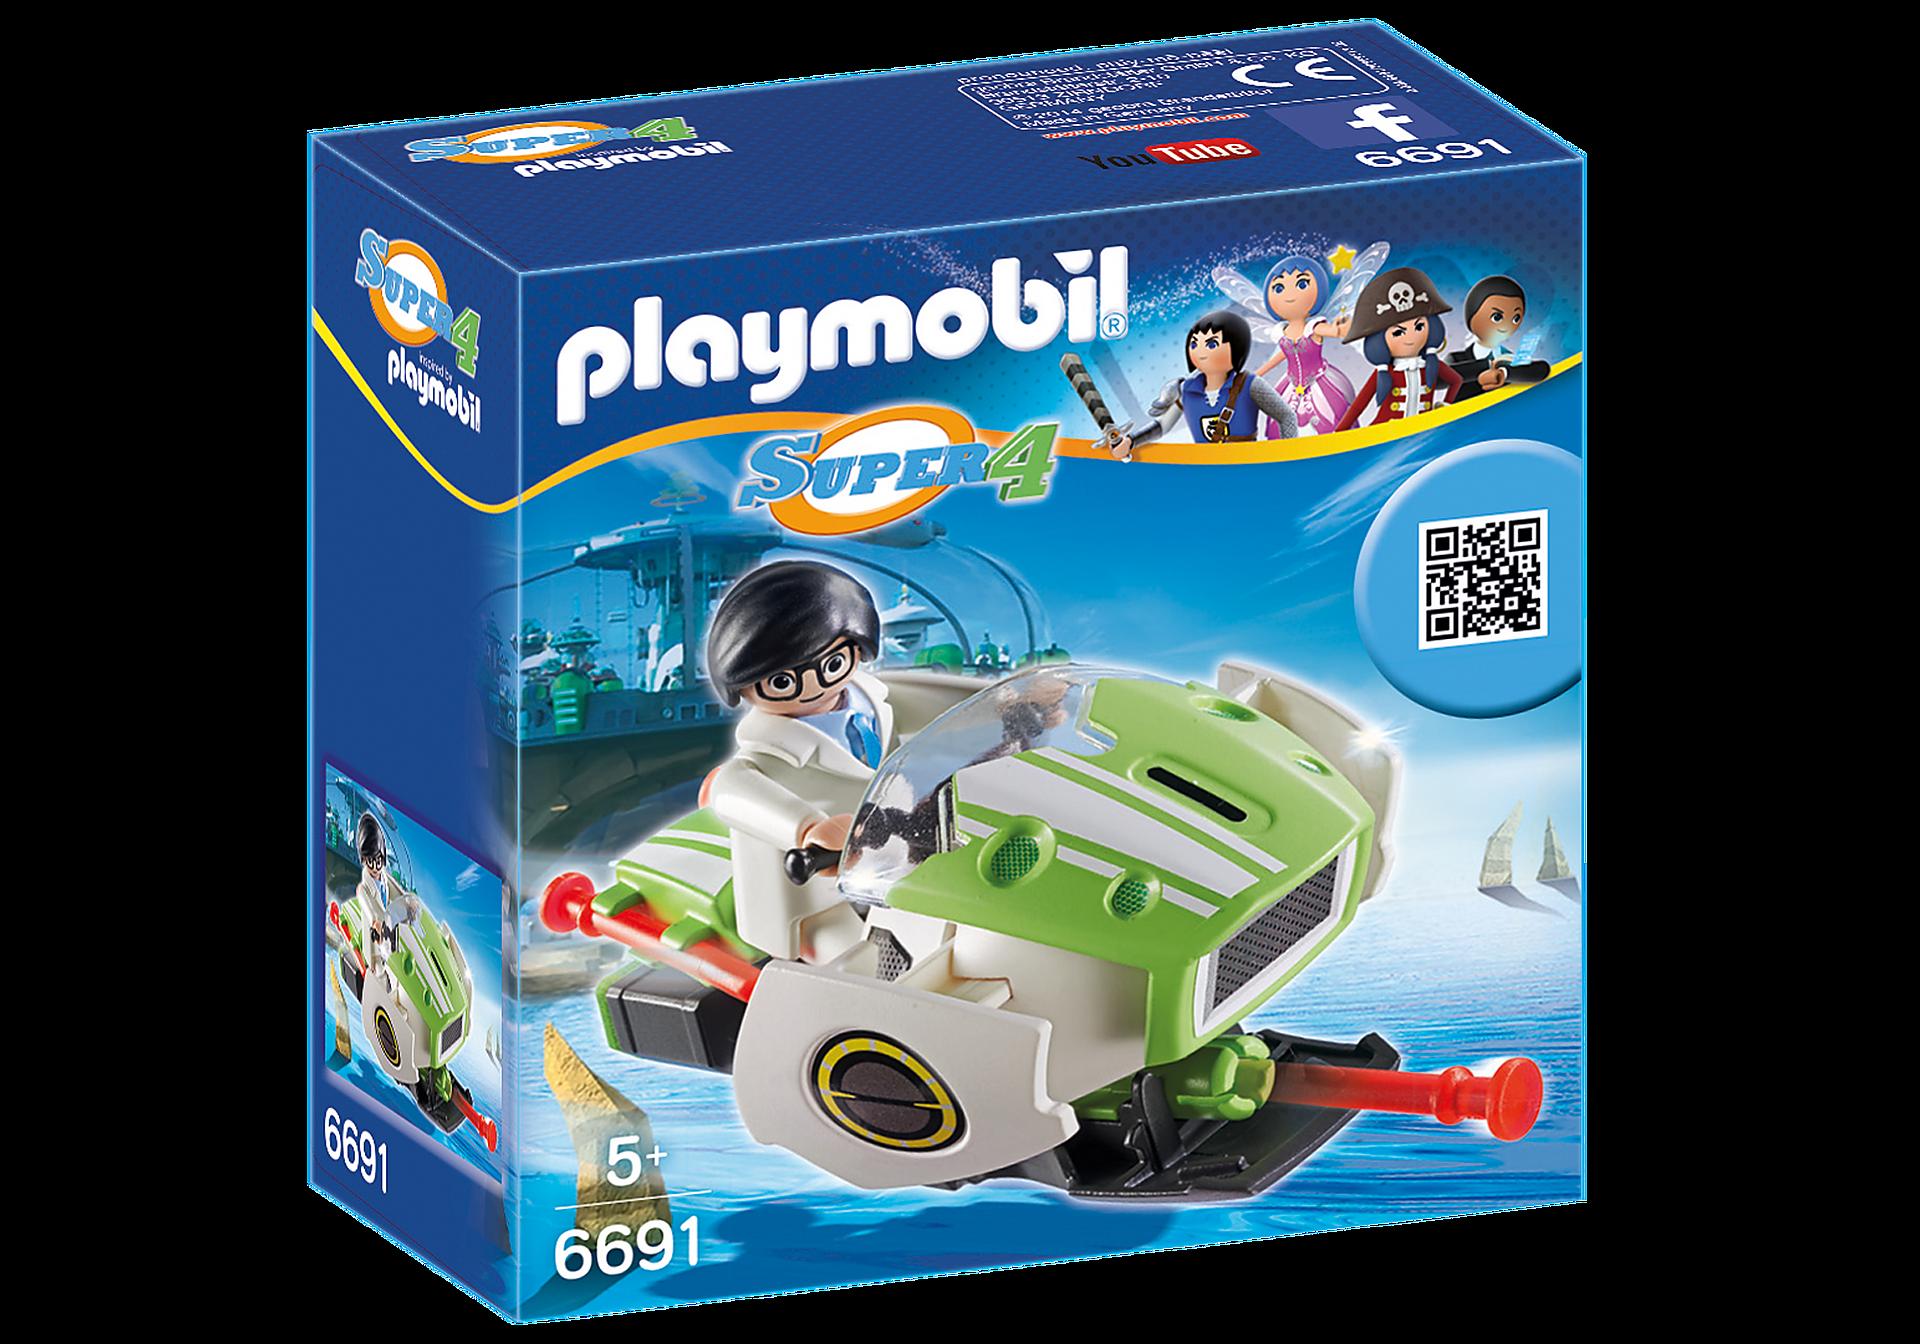 http://media.playmobil.com/i/playmobil/6691_product_box_front/Скайджет